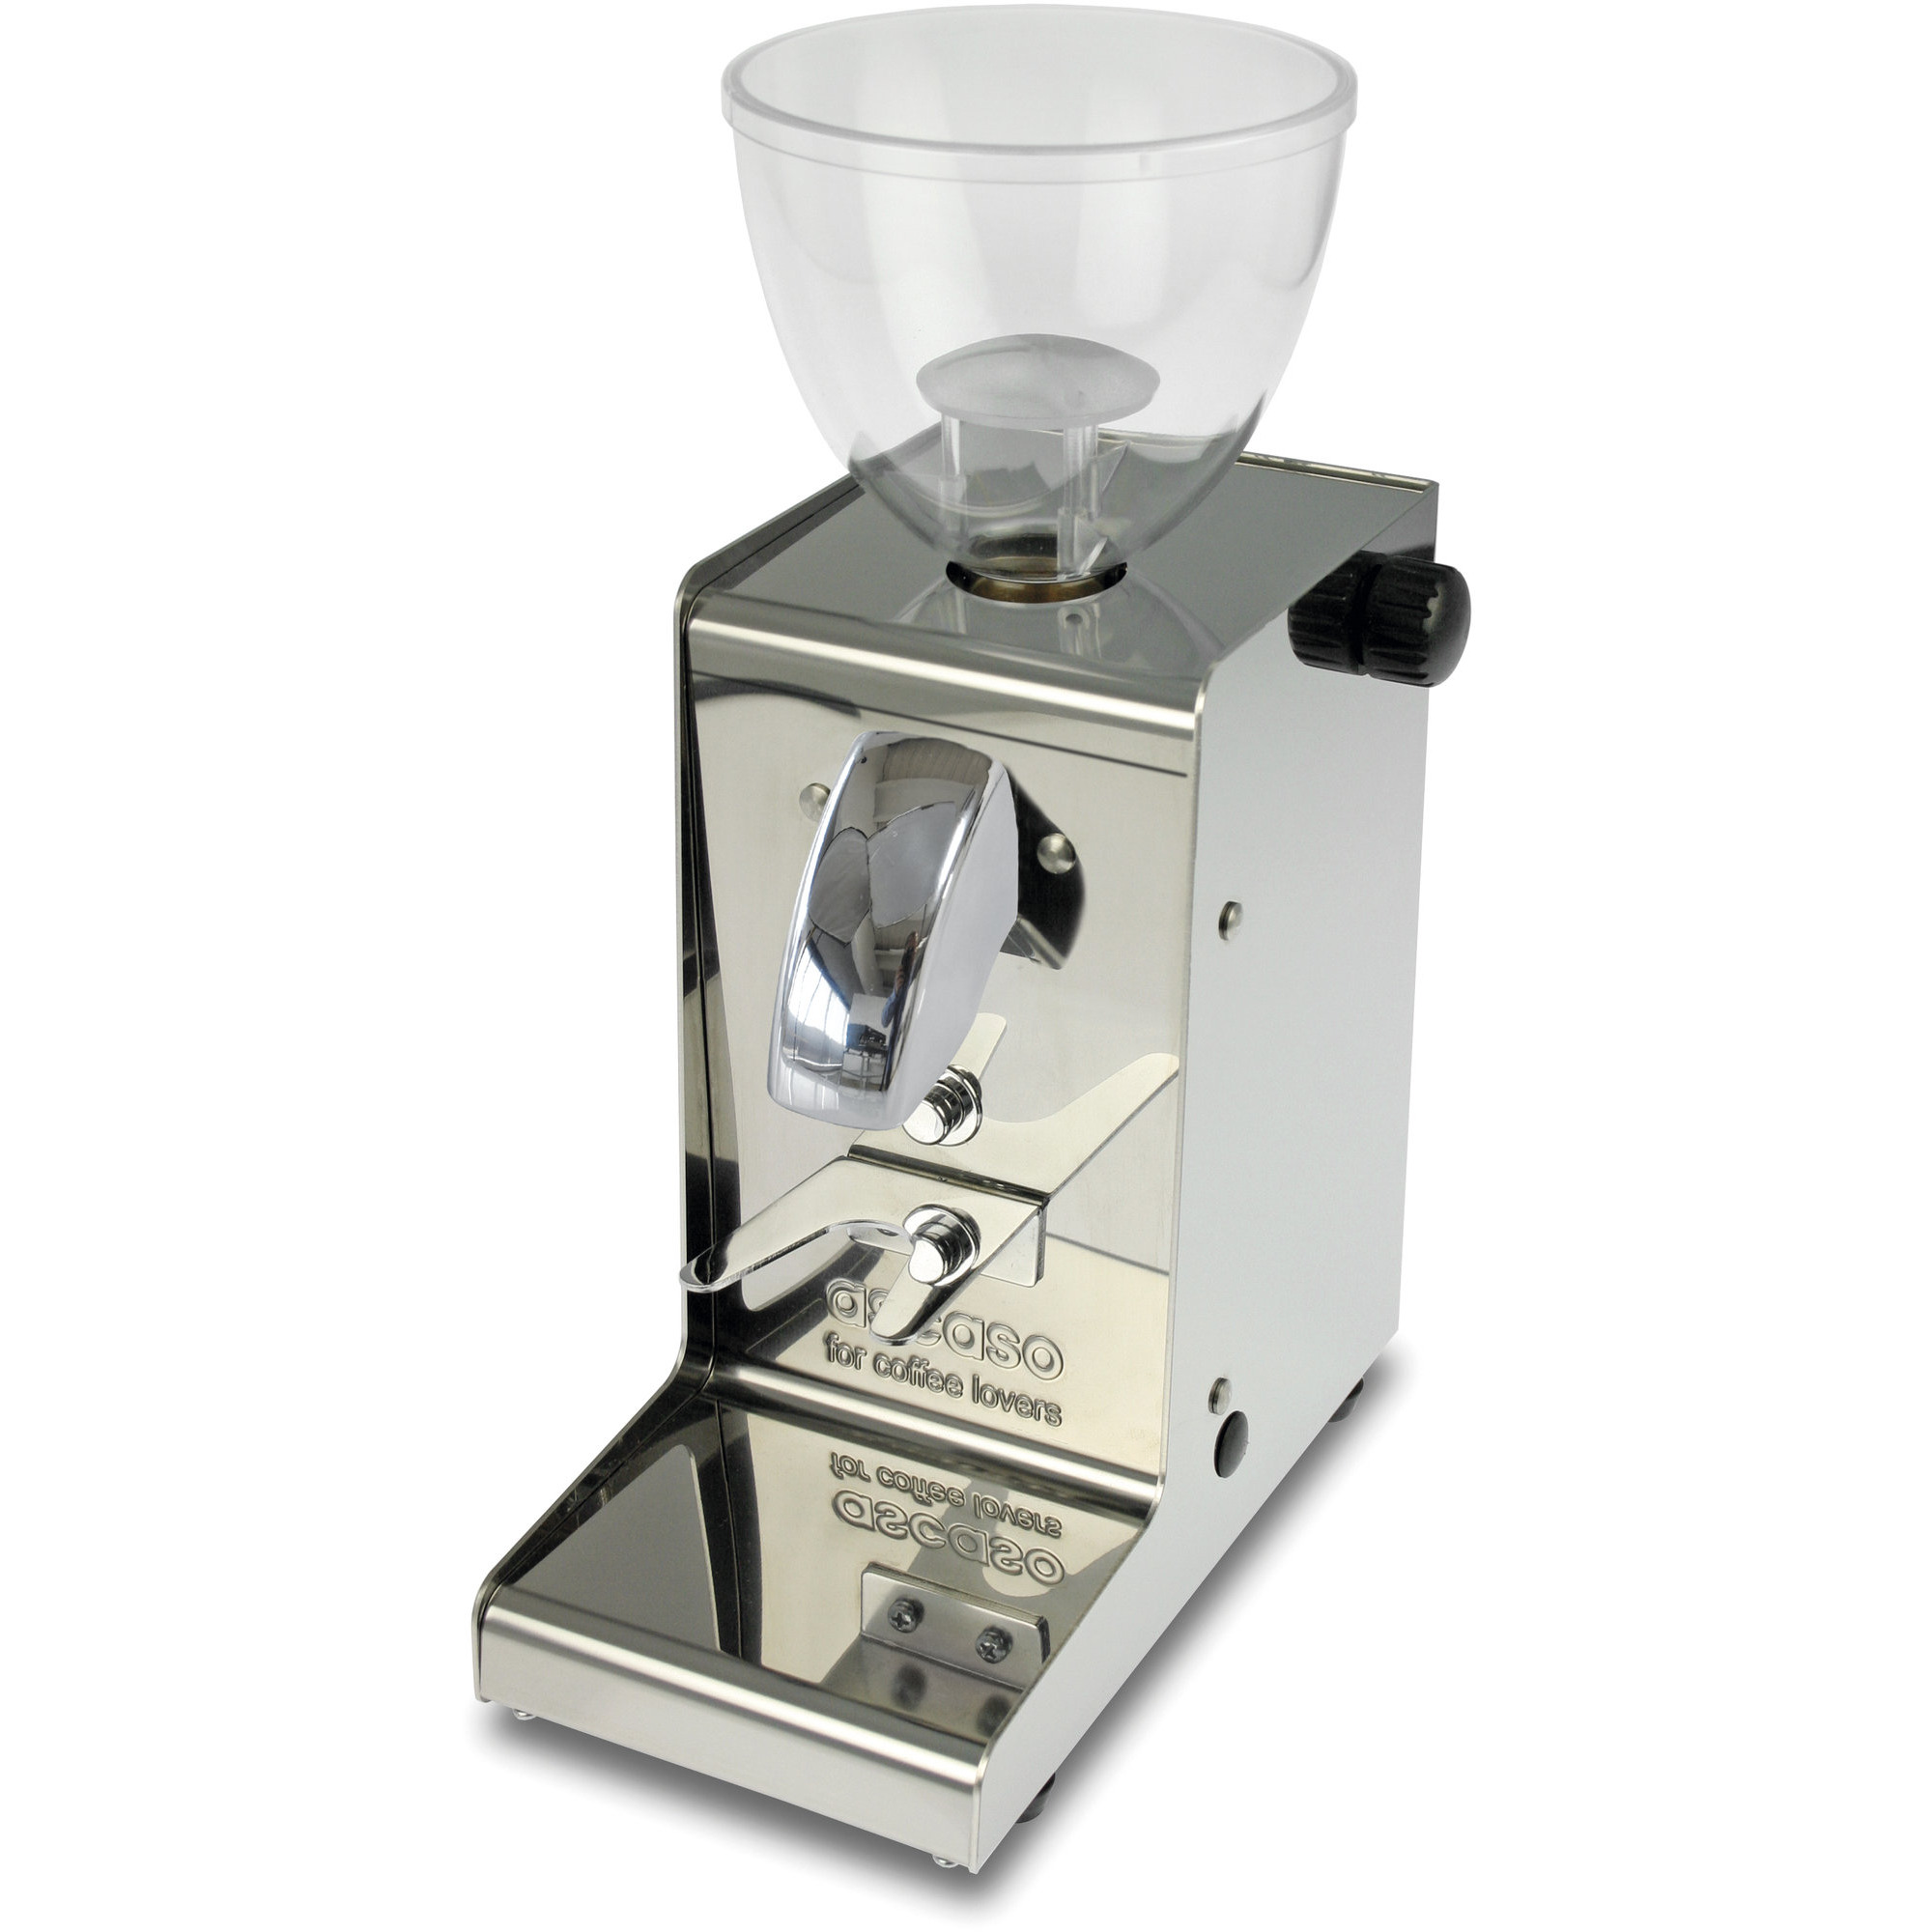 Ascaso i-Steel Kaffekvarn